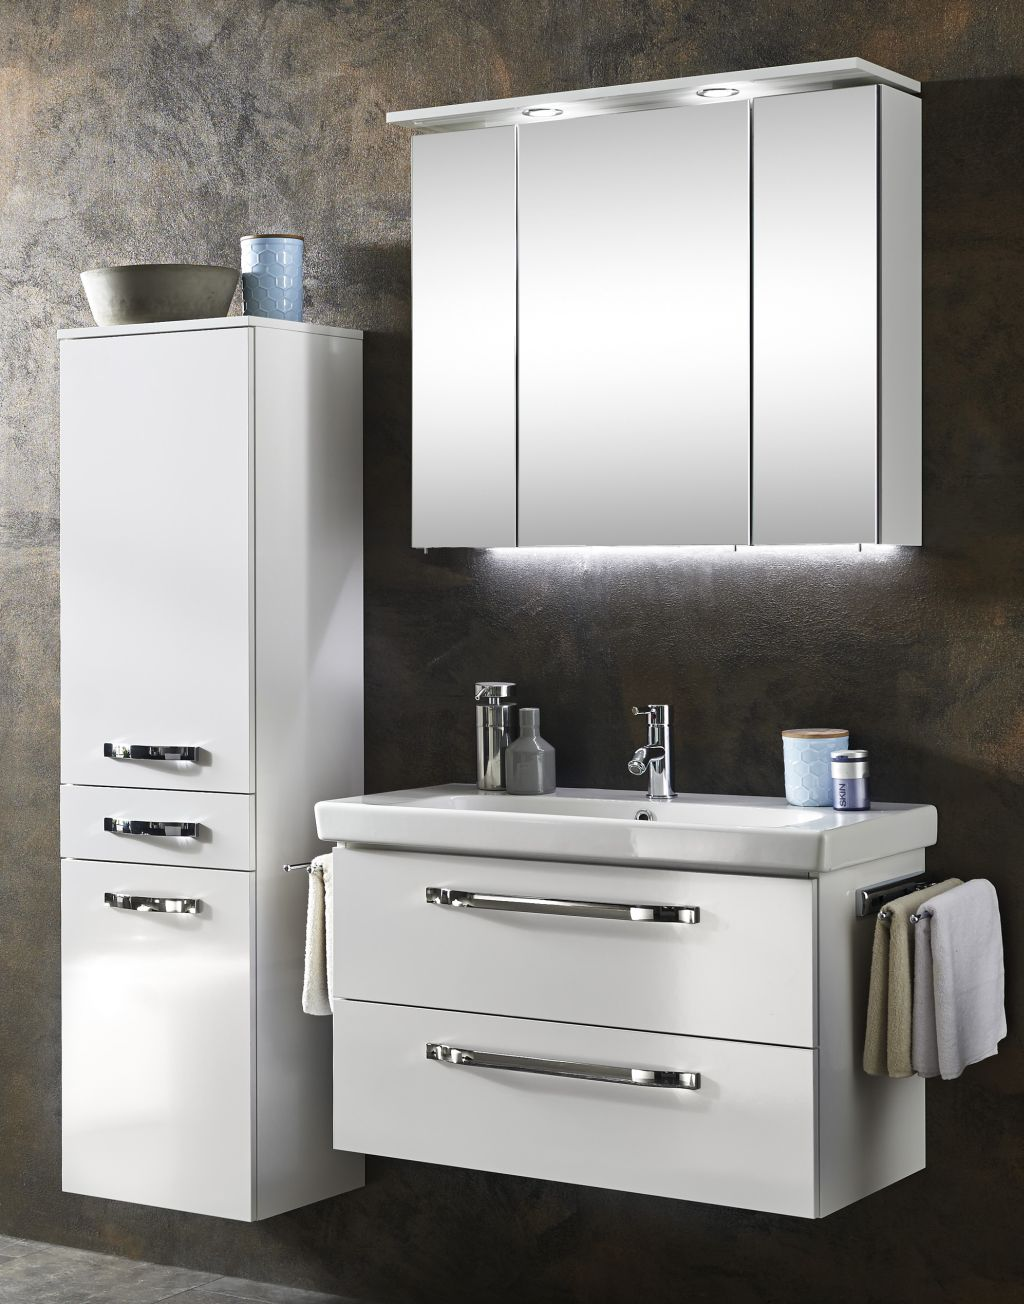 marlin bad 3060 kombination 80 cm keramik 1 g nstig kaufen m bel universum. Black Bedroom Furniture Sets. Home Design Ideas